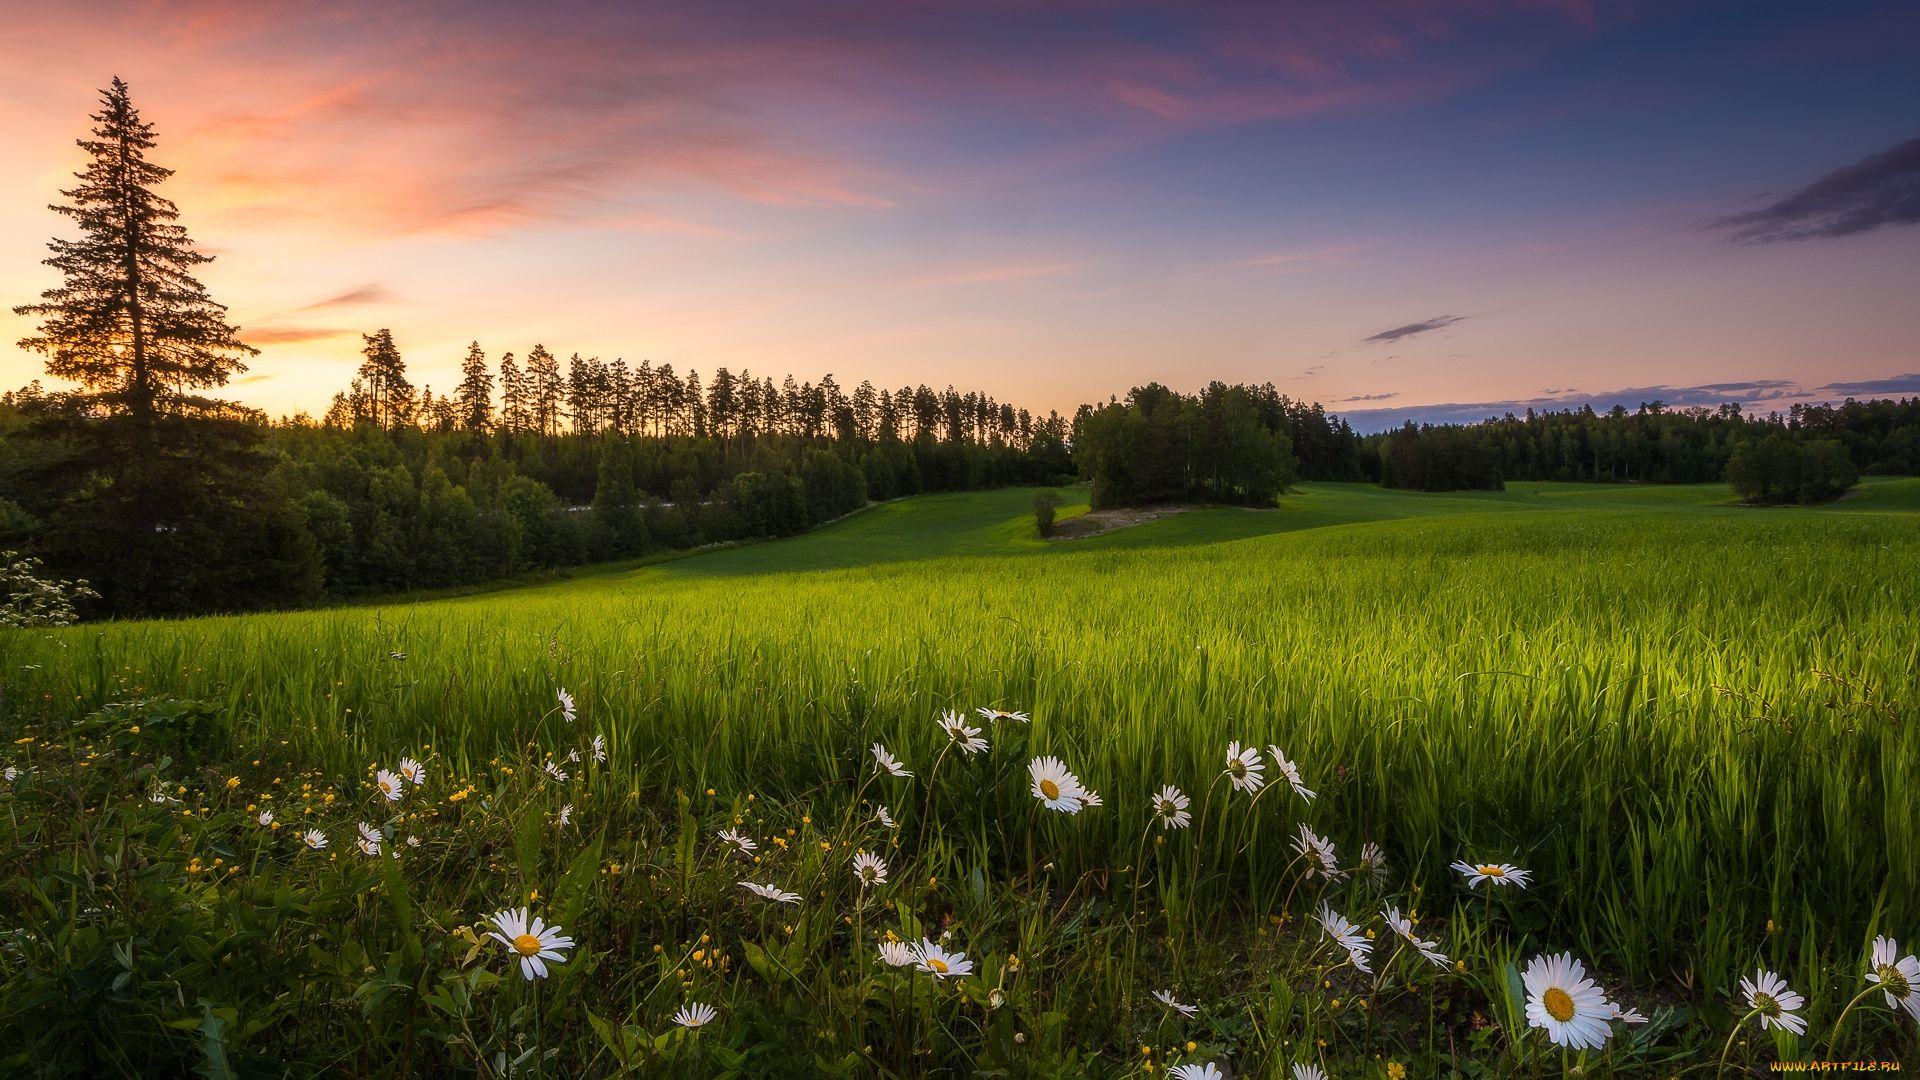 Meadow Download Wallpaper